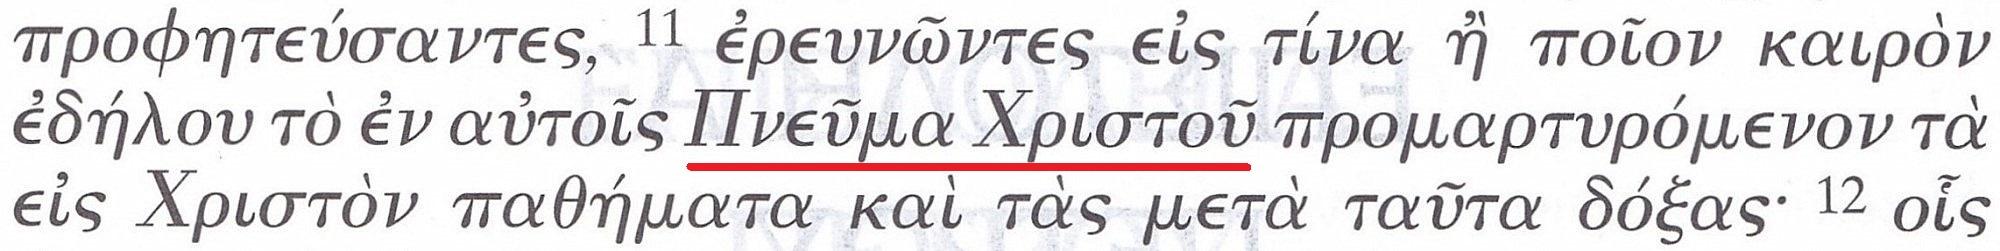 Nowy Testament Grecko-grecki